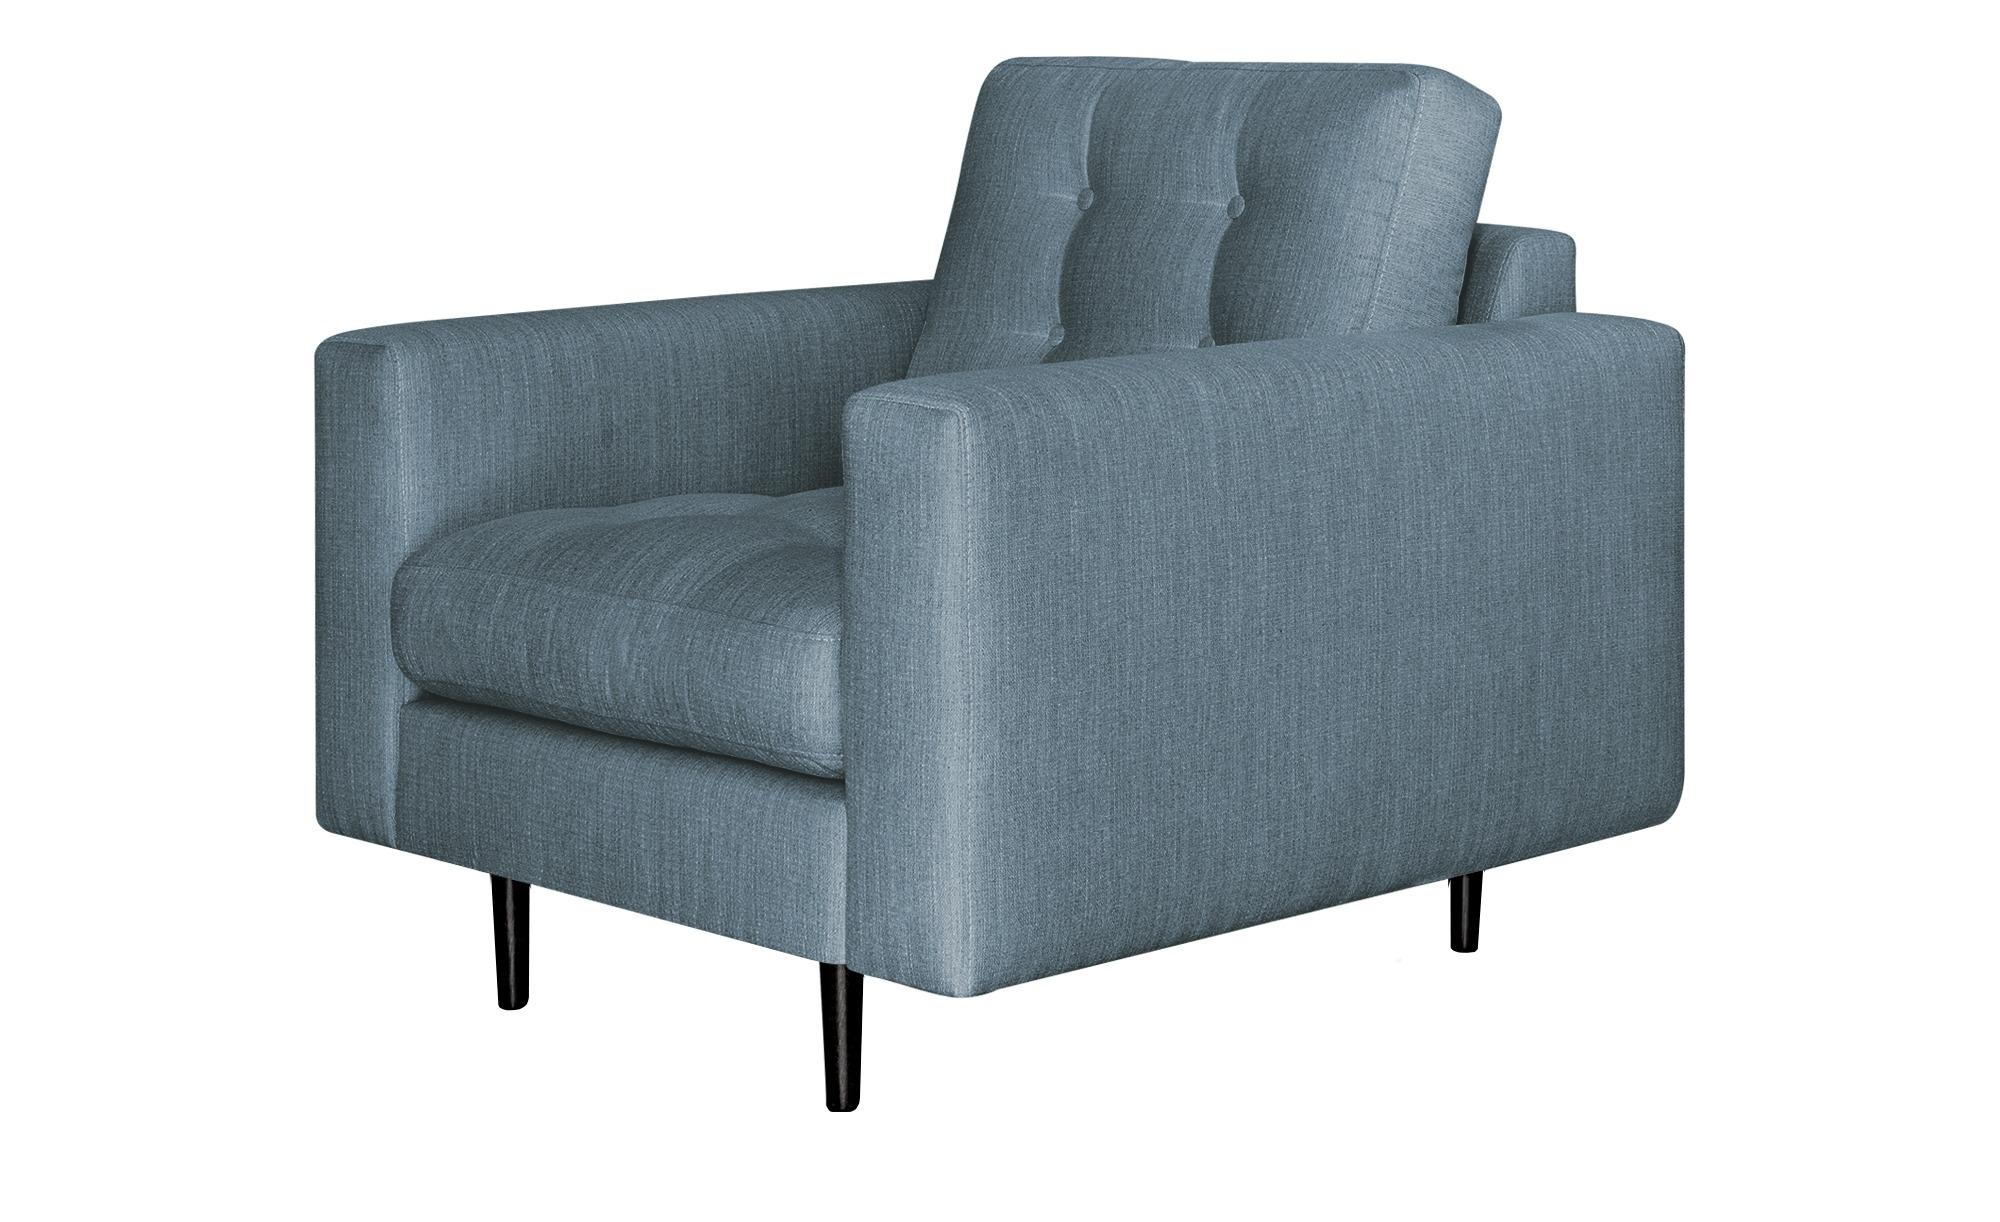 Gray & Jones Sessel  Gypsy ¦ blau ¦ Maße (cm): B: 97 H: 90 T: 92 Polstermöbel > Sessel > Polstersessel - Höffner